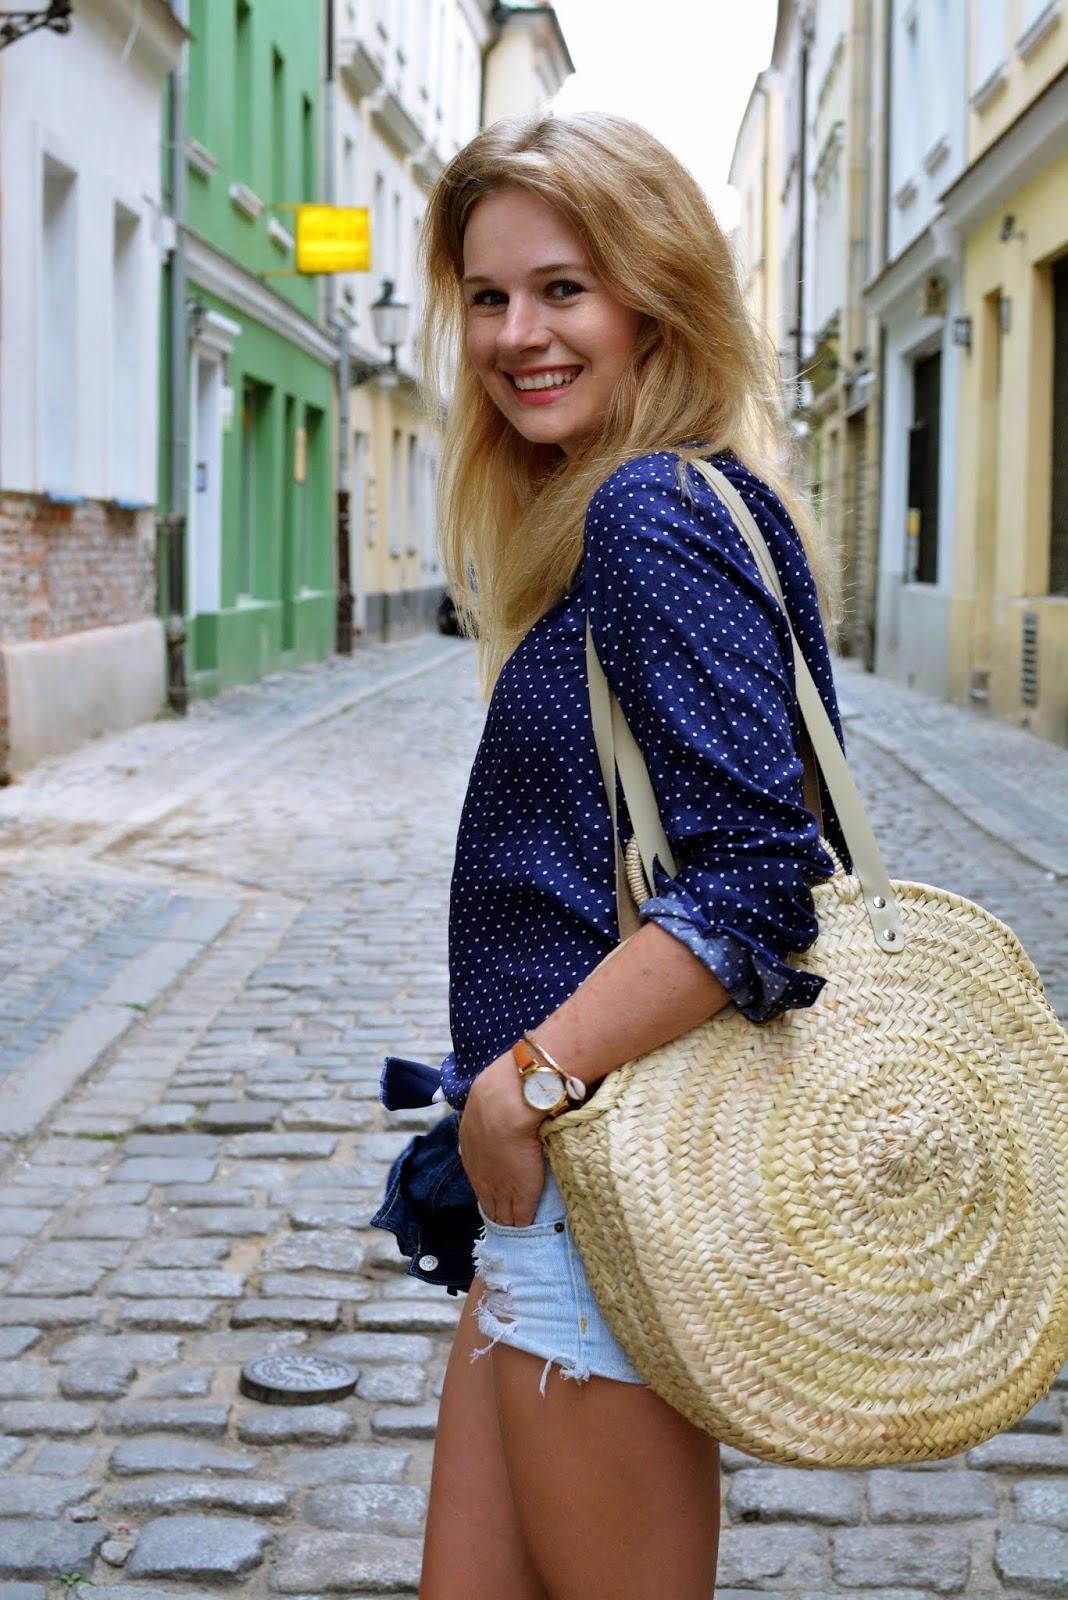 basket bag, kosz, koszyk, round basket, kamila libelula bag, blog, blogger, poznan, okragly koszyk